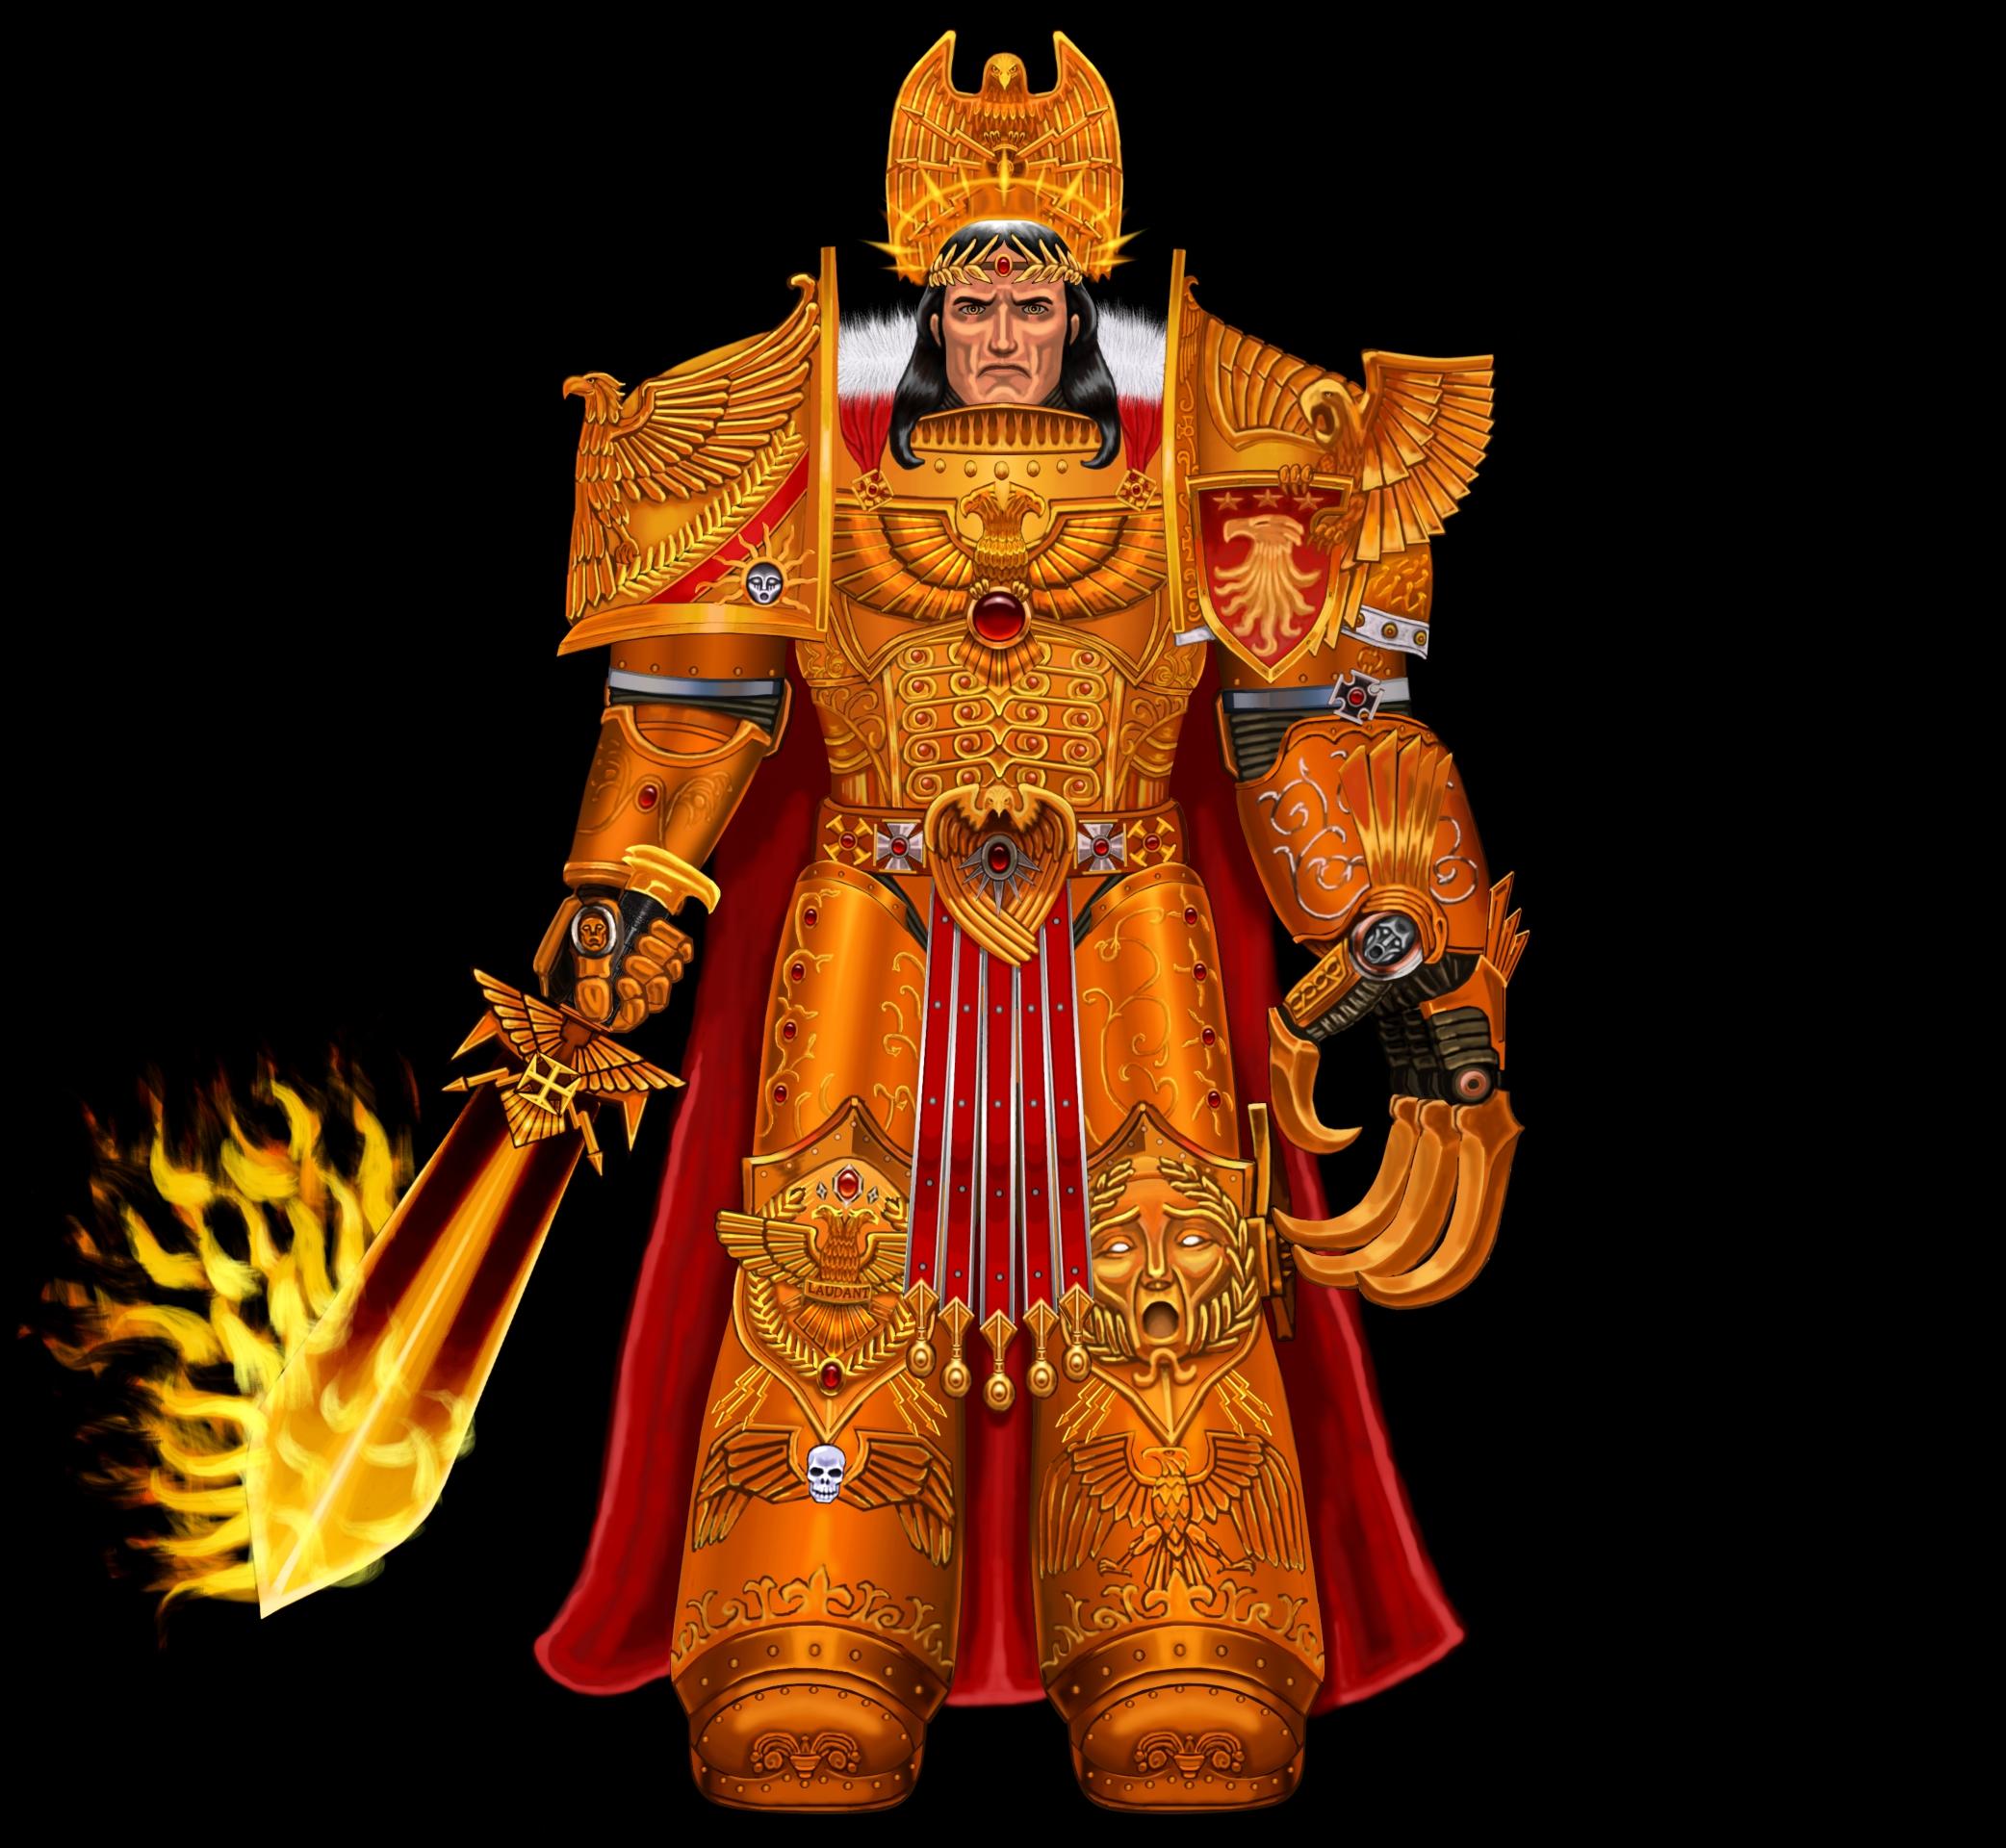 the Emperor of Mankind v0.2 by Mr-retro-Man on DeviantArt